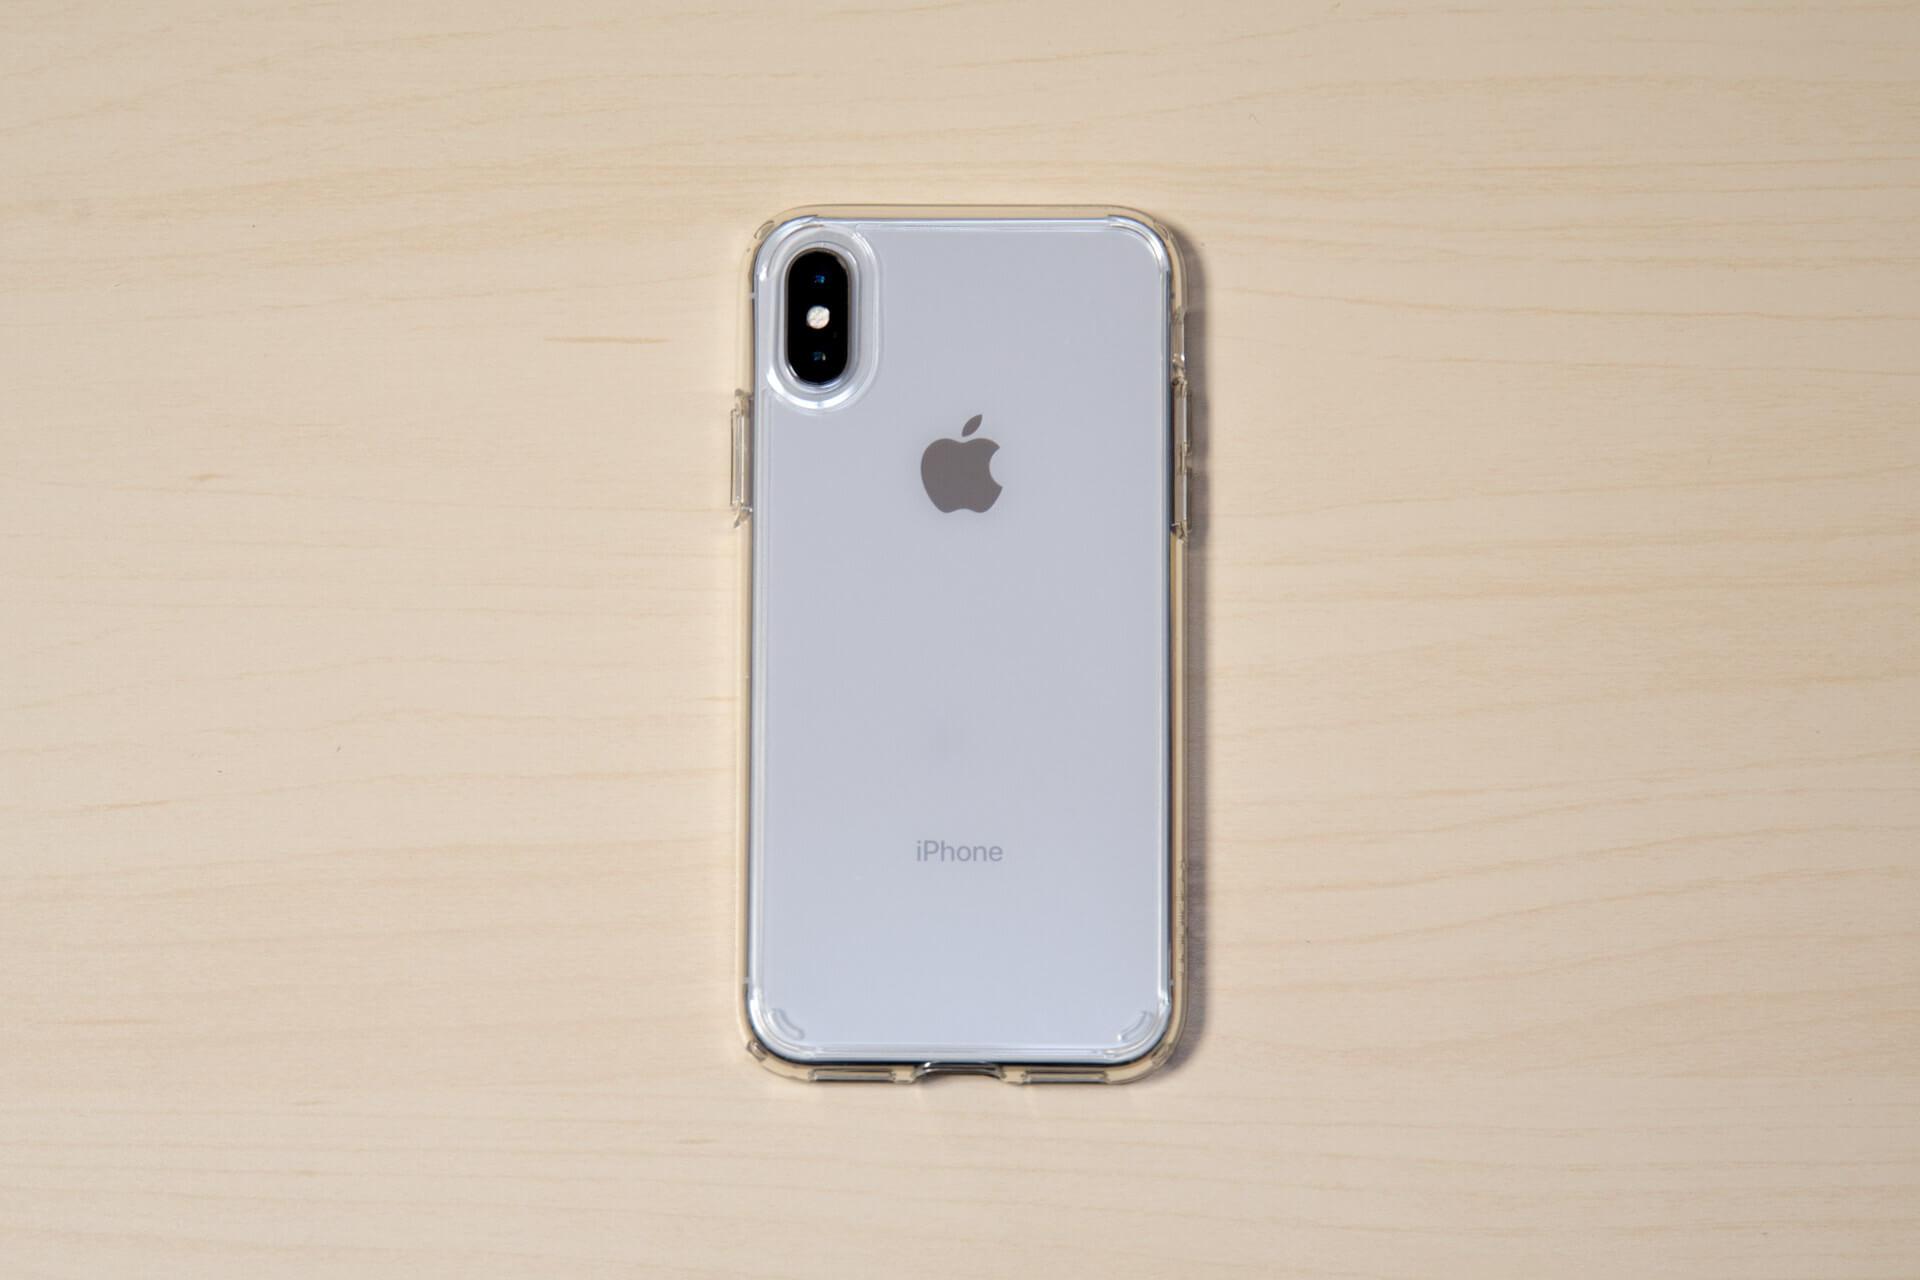 Spigen iPhone X ケース ウルトラ・ハイブリッド 4